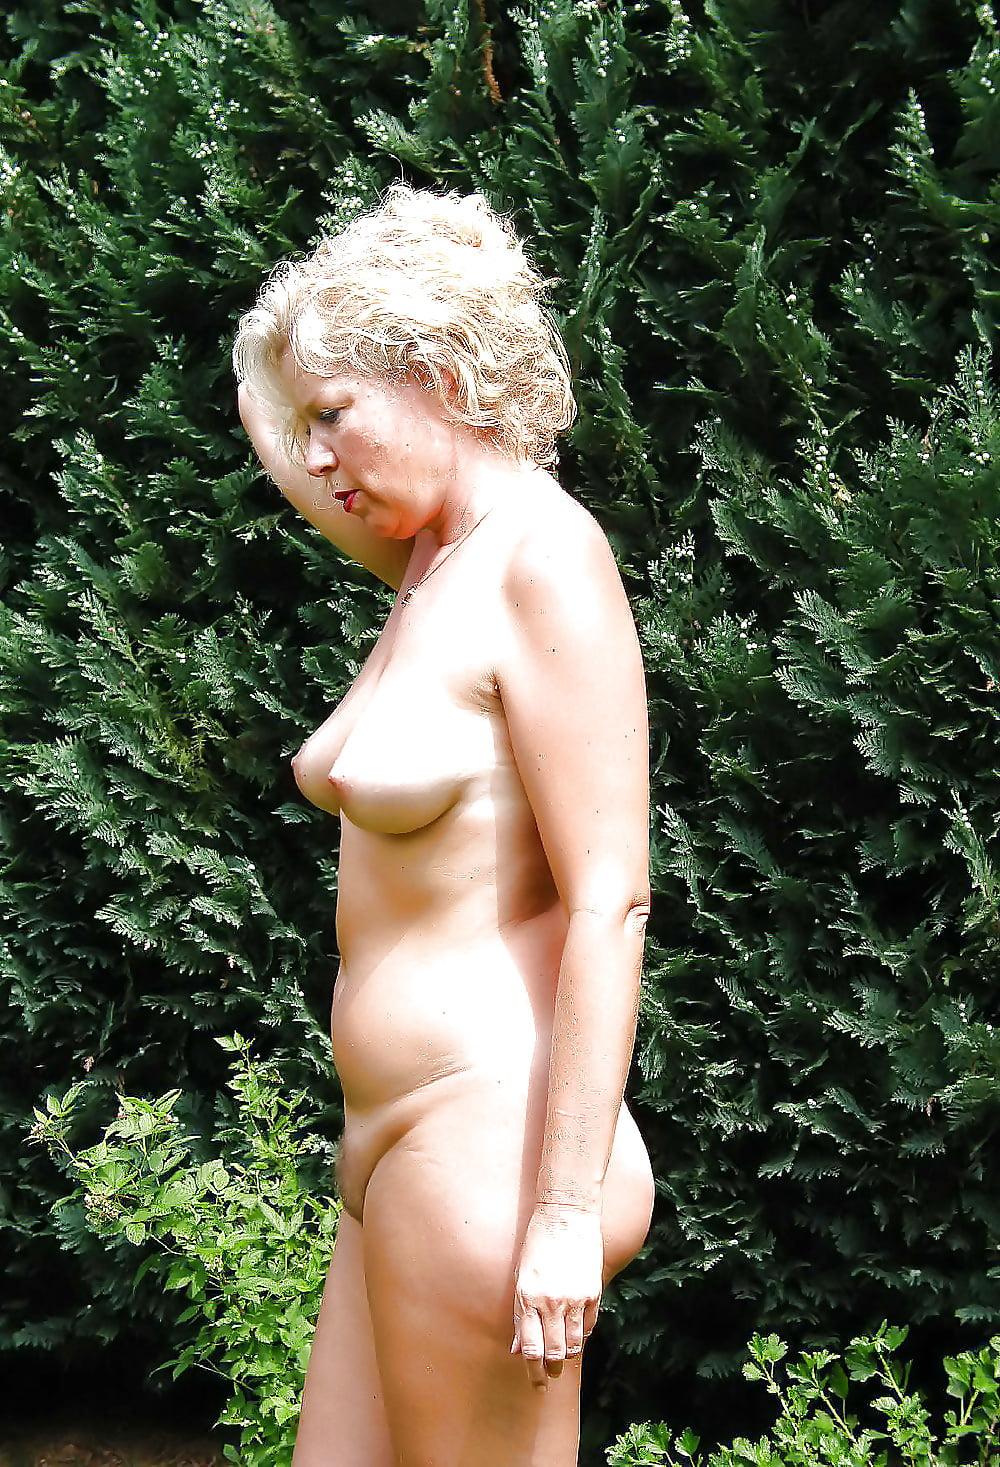 Hot amateur seniors nude — pic 2